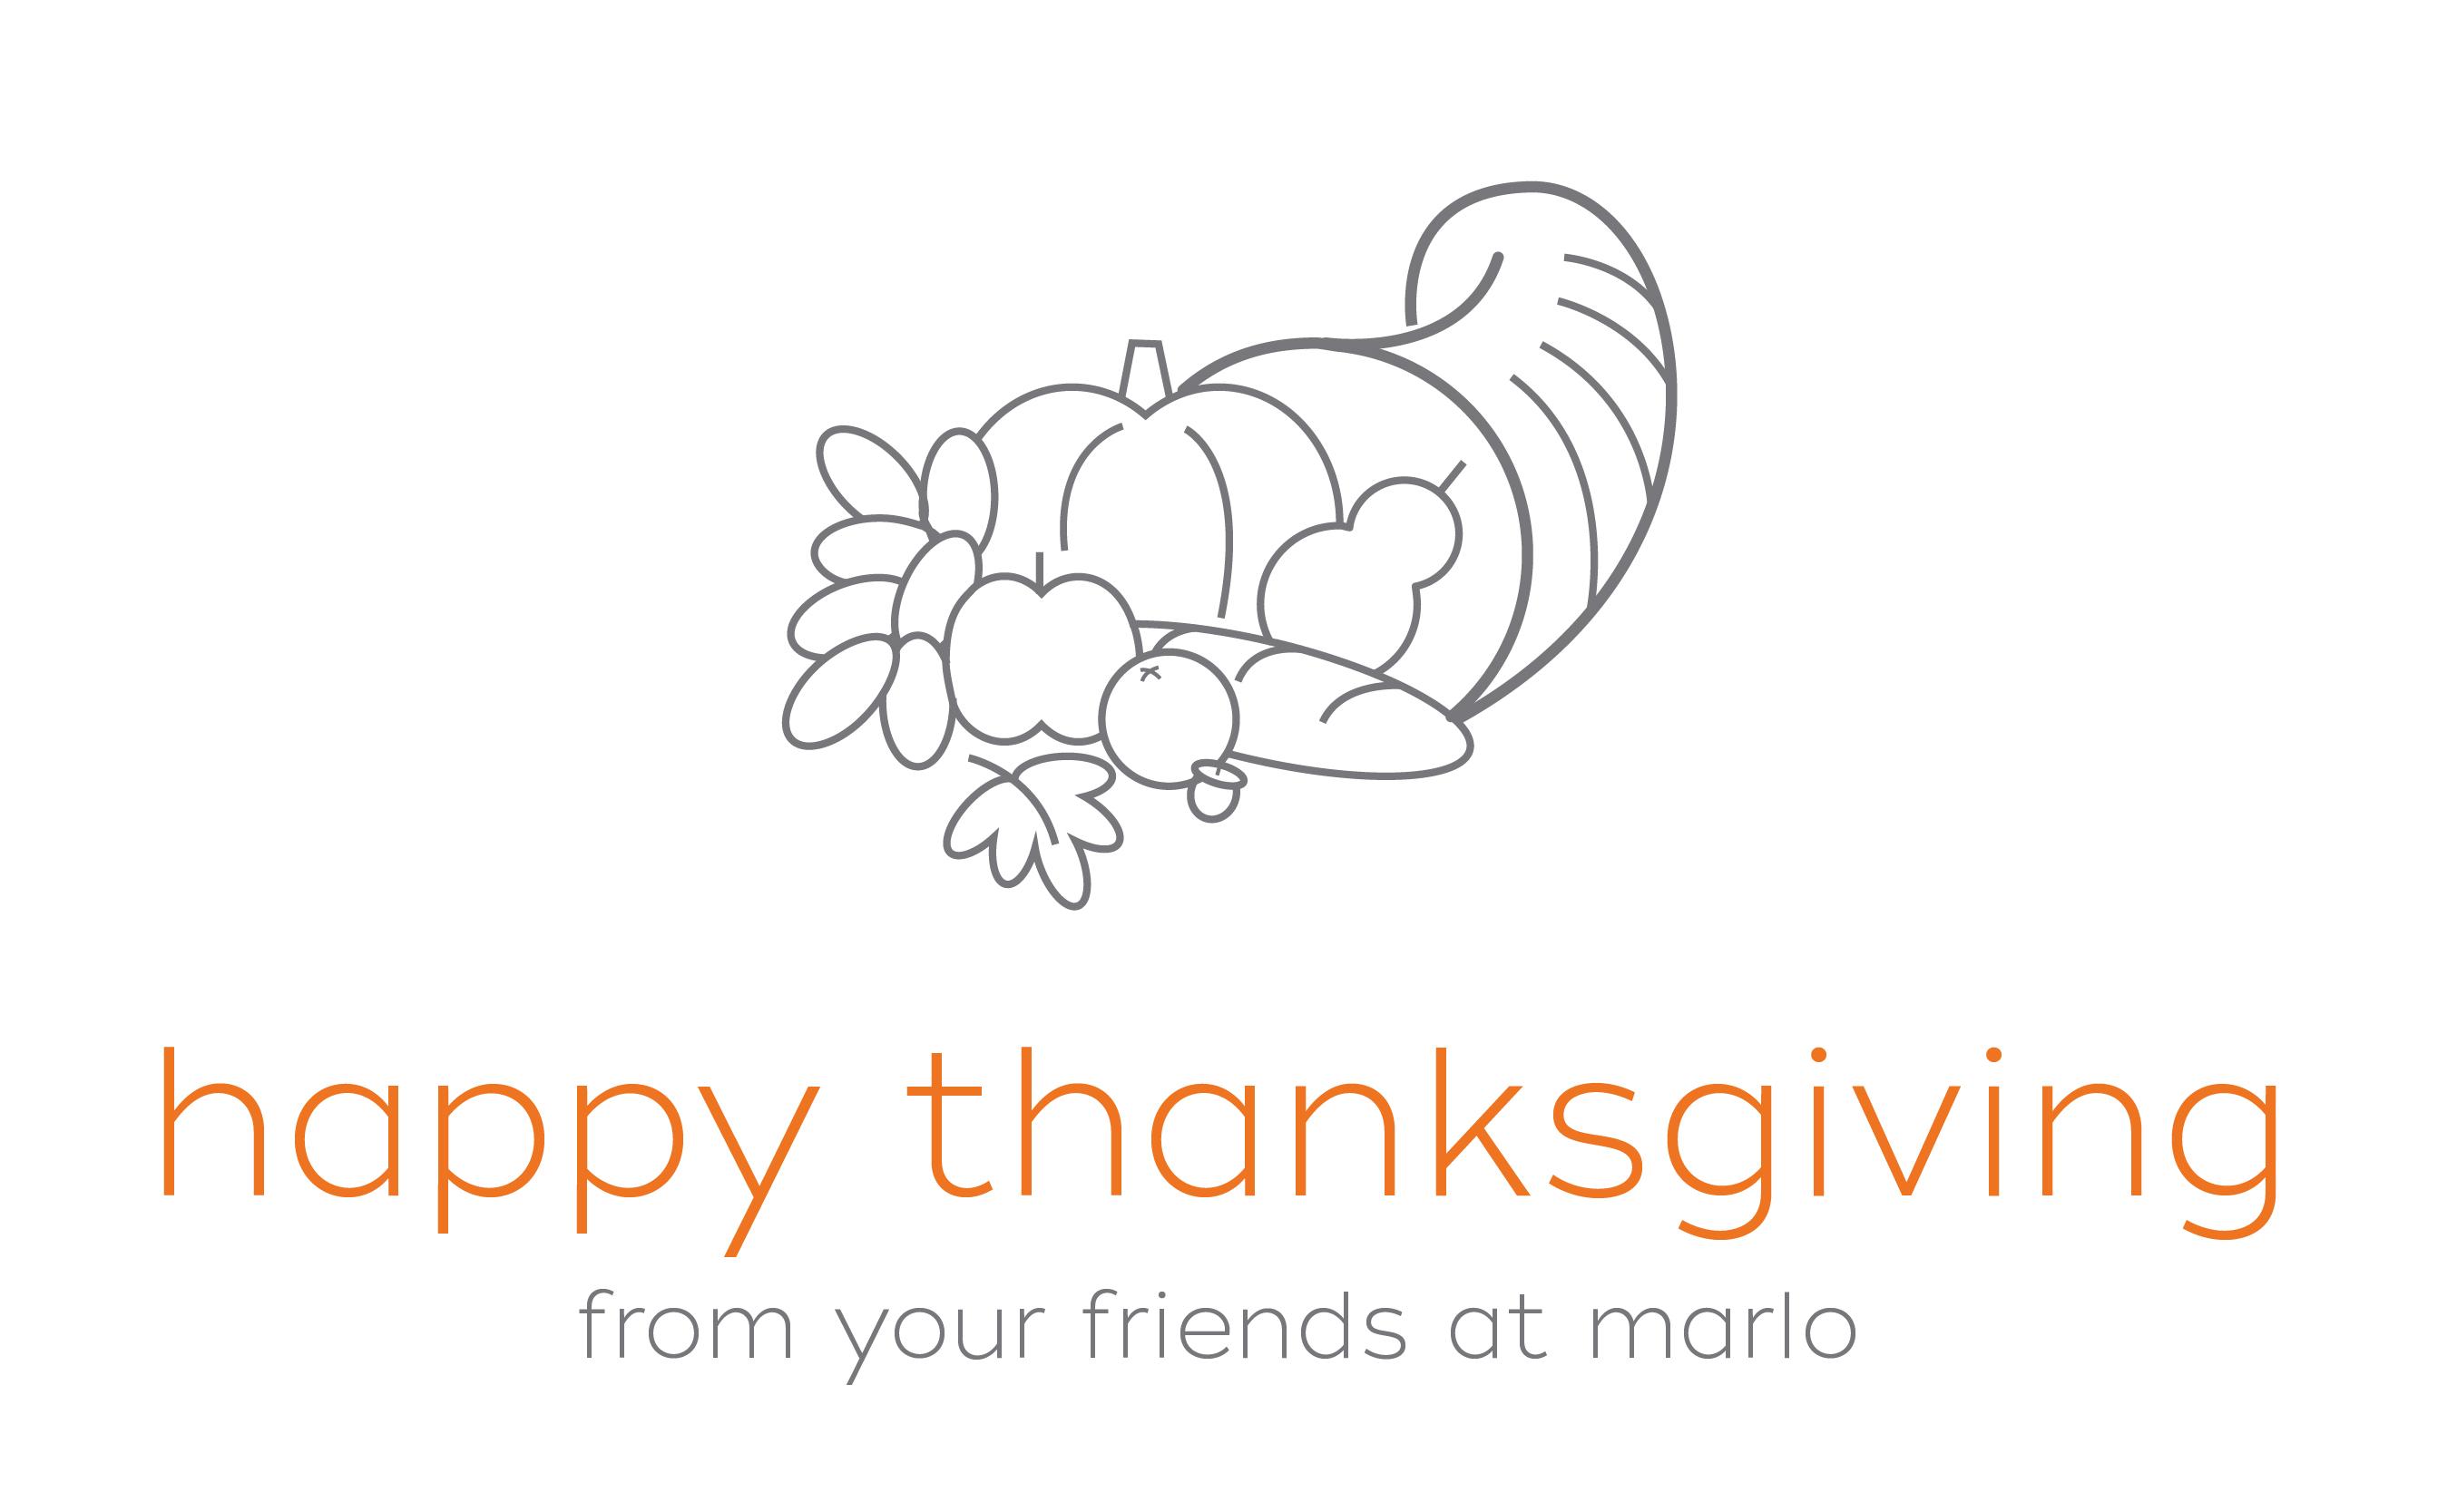 ThanksgivingMBlog-02